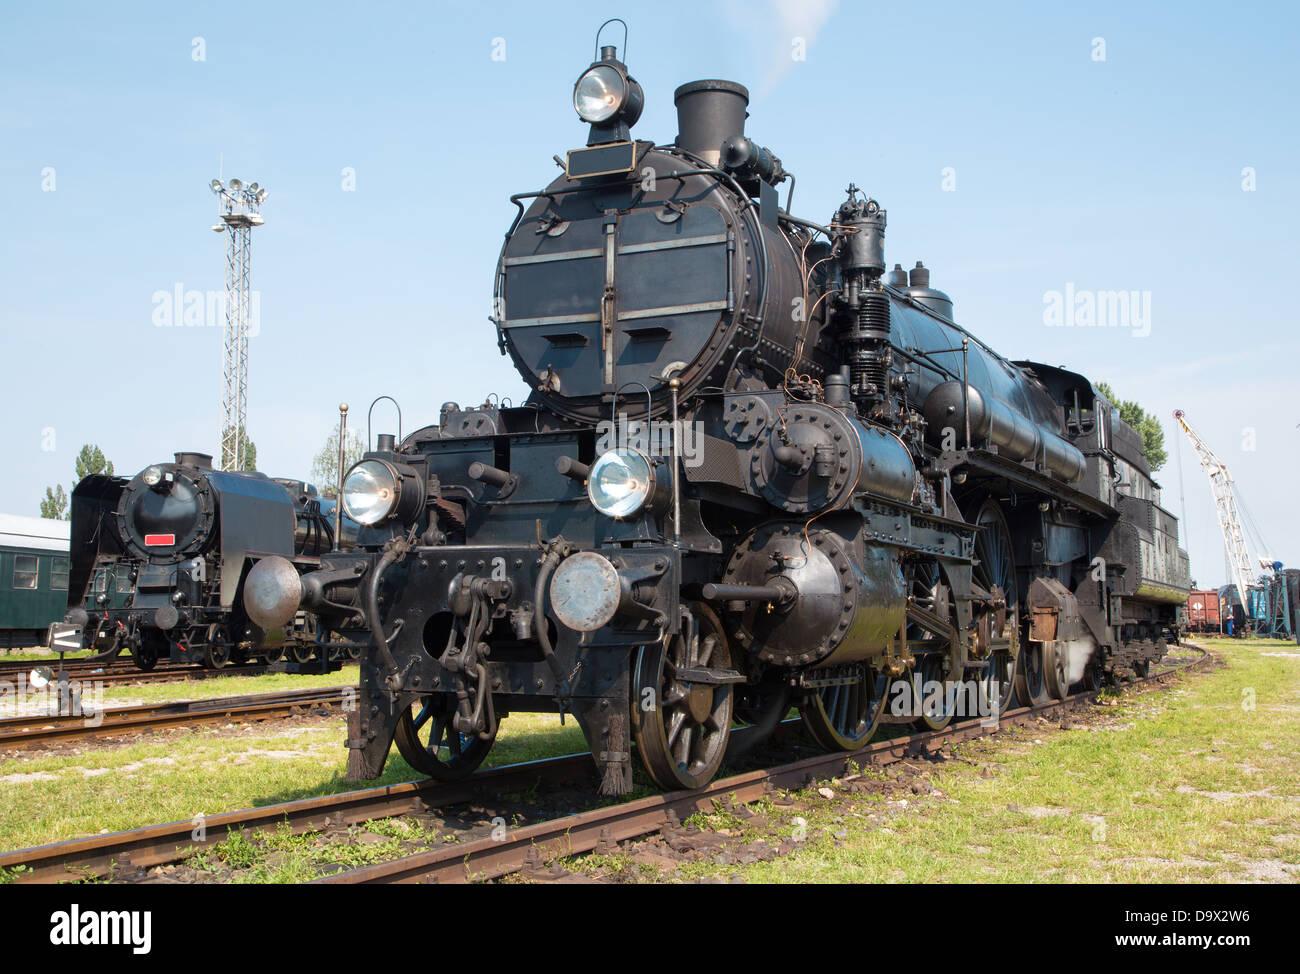 old steam locomotive - Stock Image